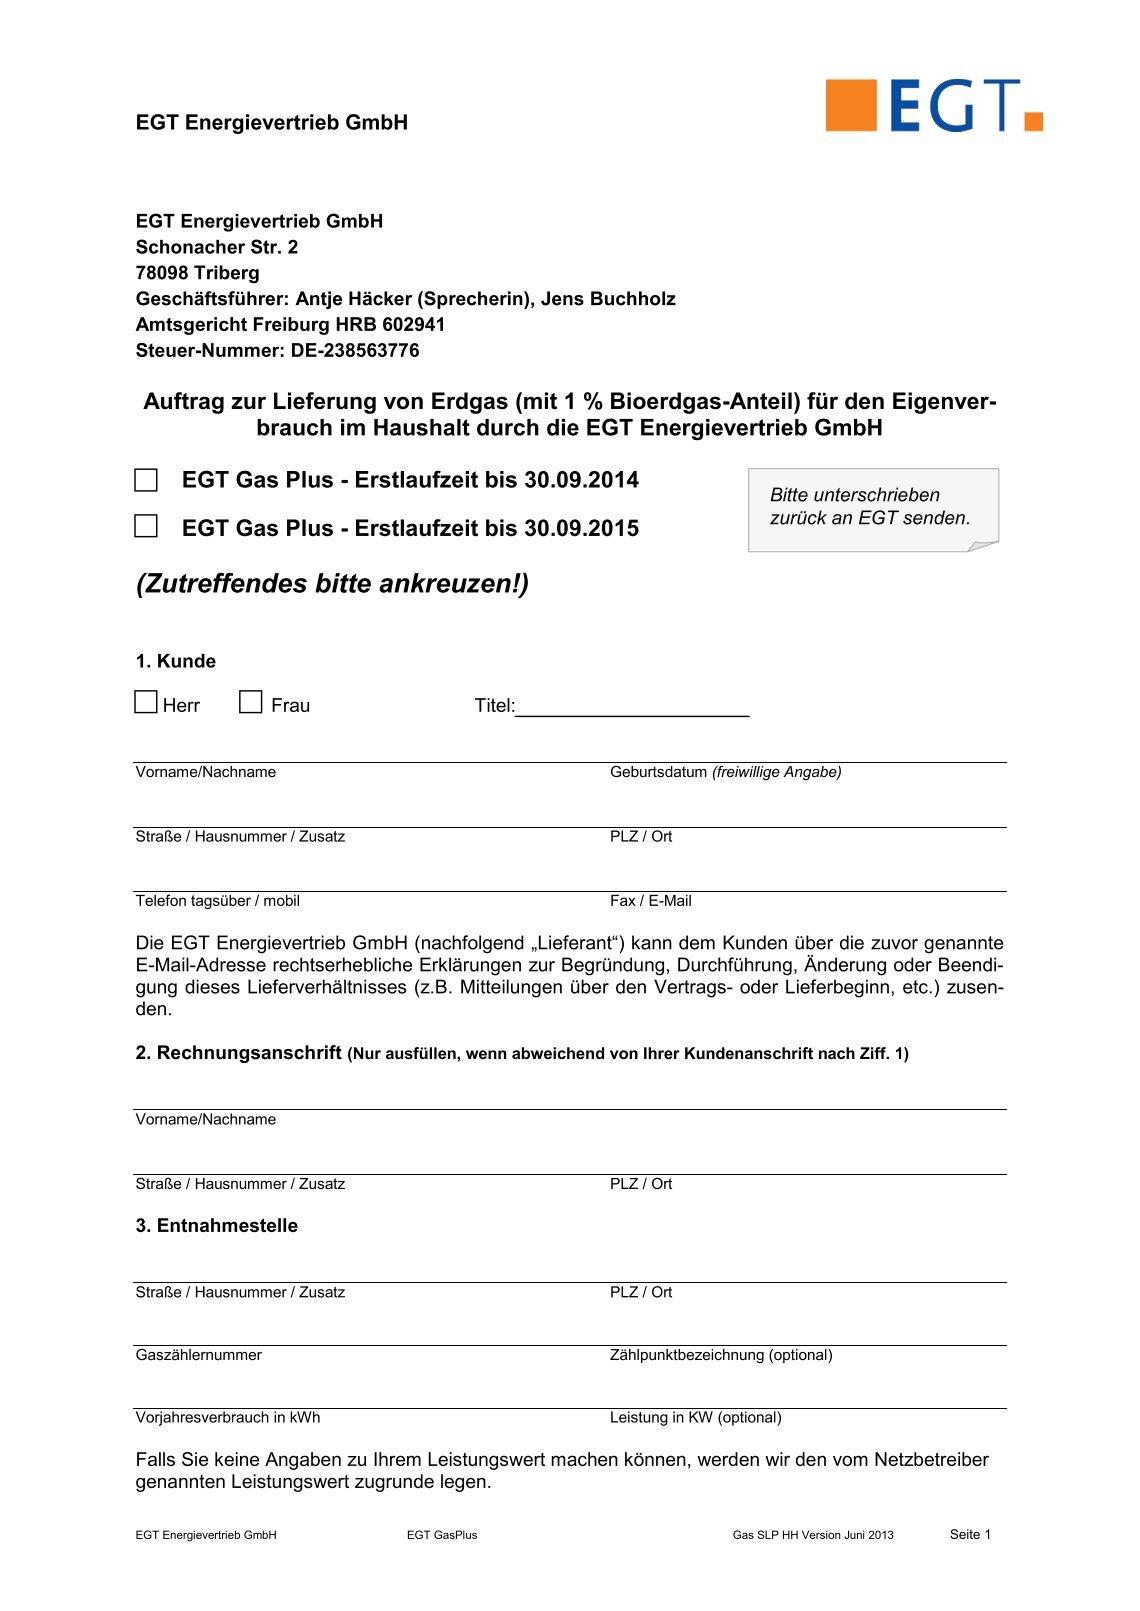 Groß Logo Vertragsvorlage Bilder - Entry Level Resume Vorlagen ...